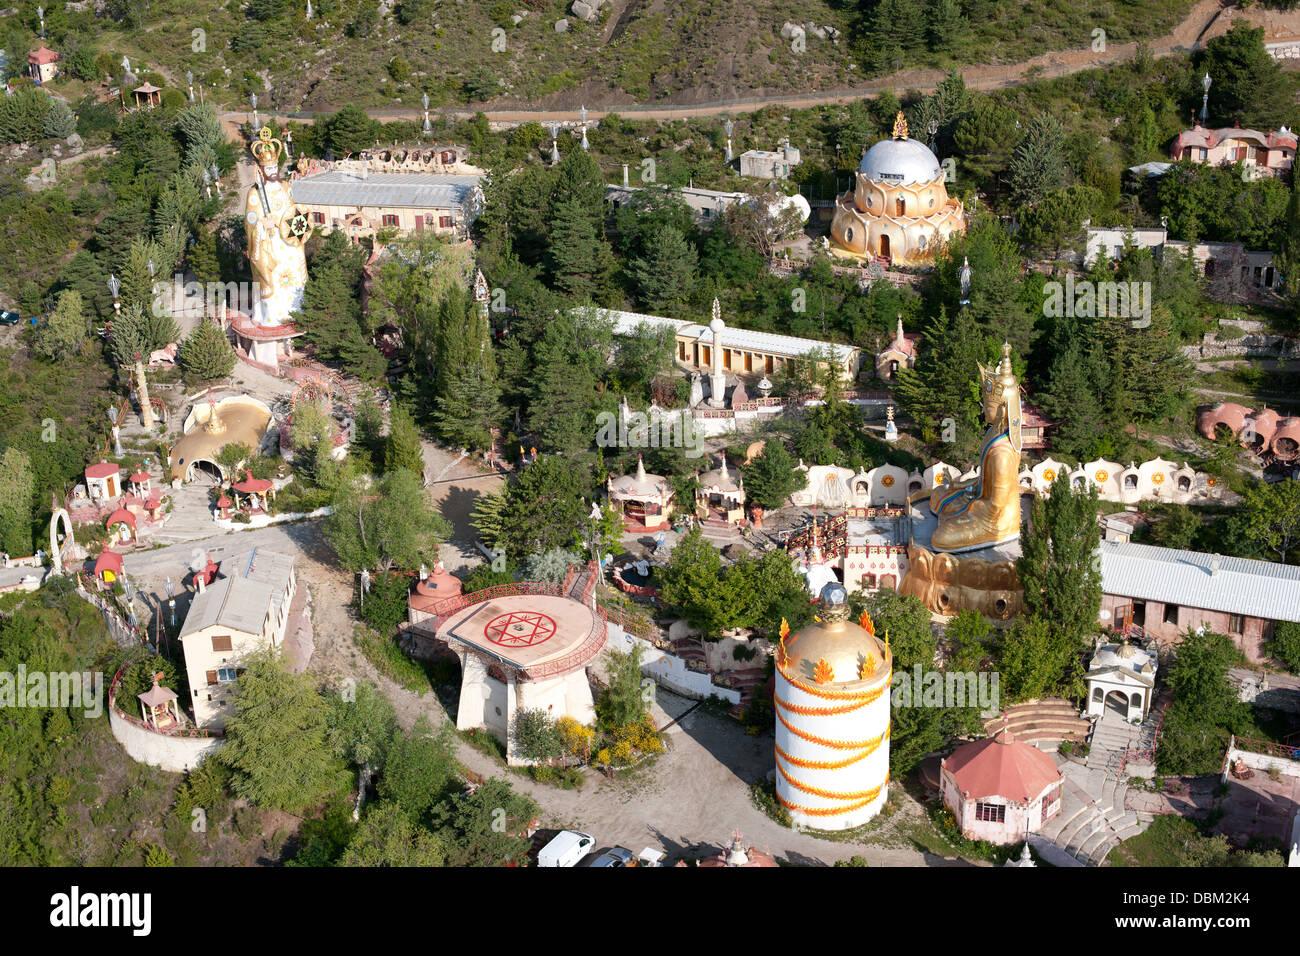 MANDAROM (vista aérea). Sede de un grupo religioso. Encima del lago Castillon, Verdon Valle, Alpes-de-Haute Imagen De Stock